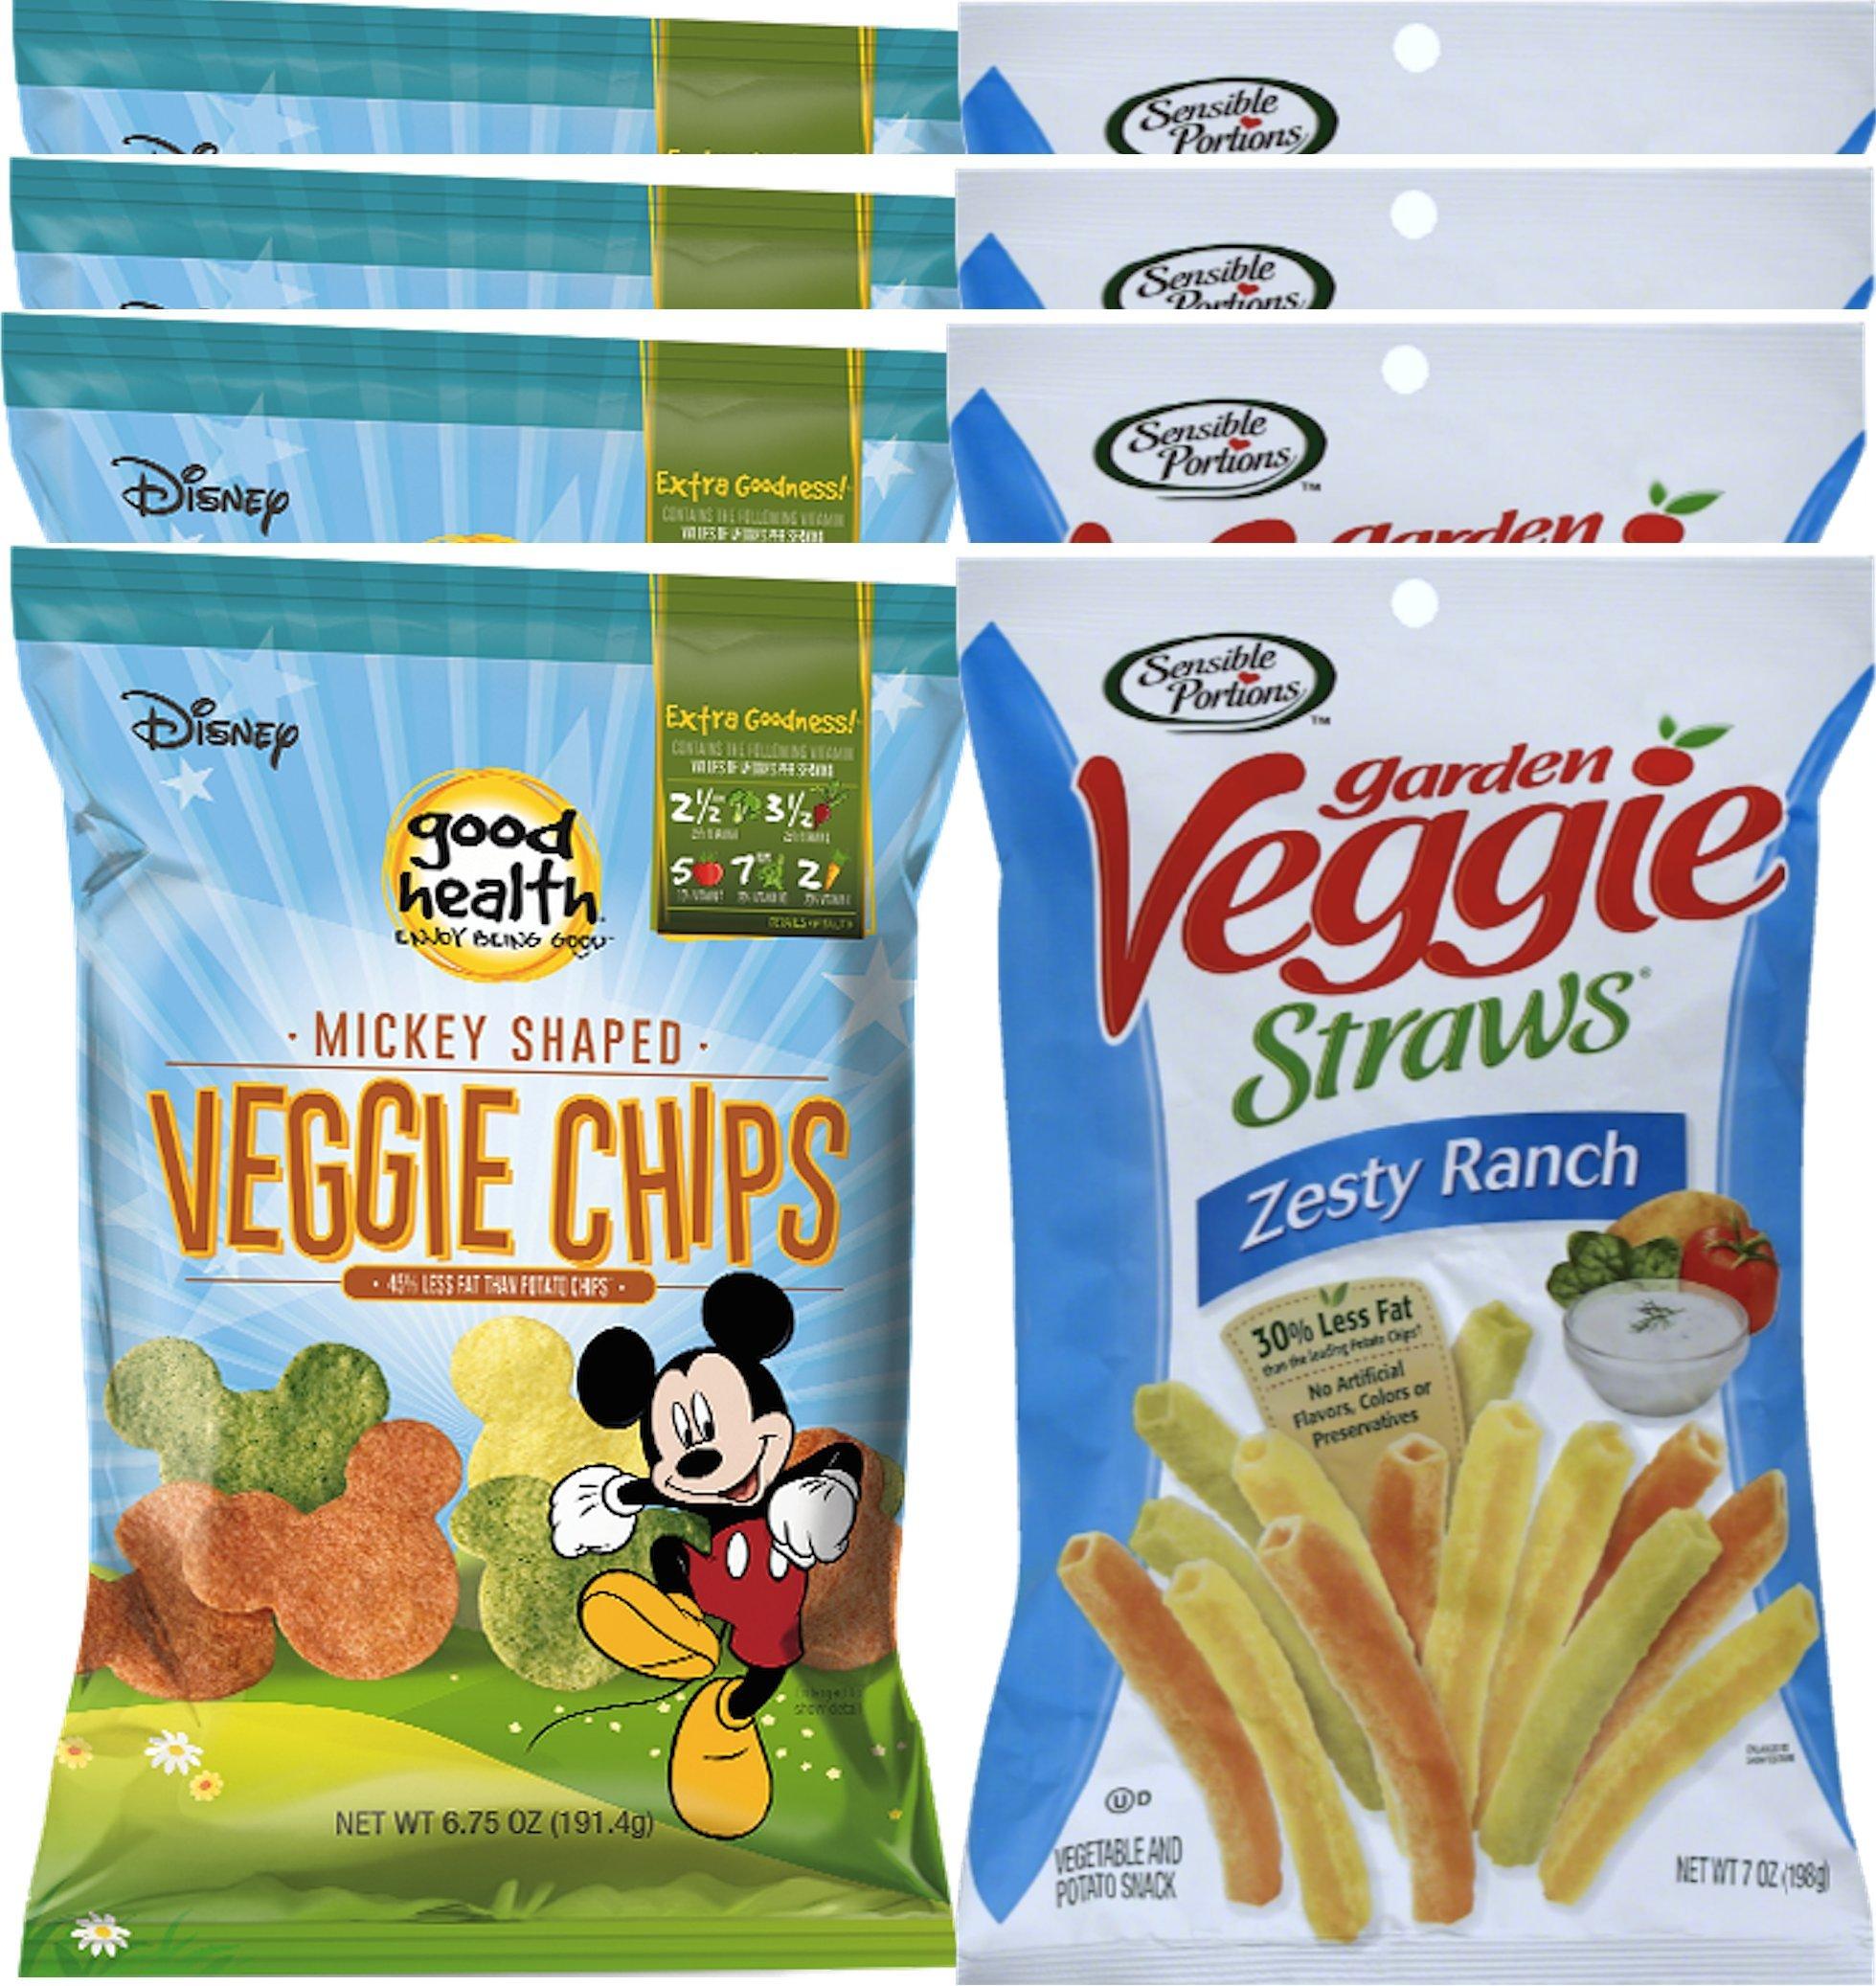 Sensible Portions Zesty Ranch Garden Veggie Straws, 7 oz & Disney Mickey Mouse Shaped Veggie Chips Children's Healthy Snacks 6.75 Oz (8)